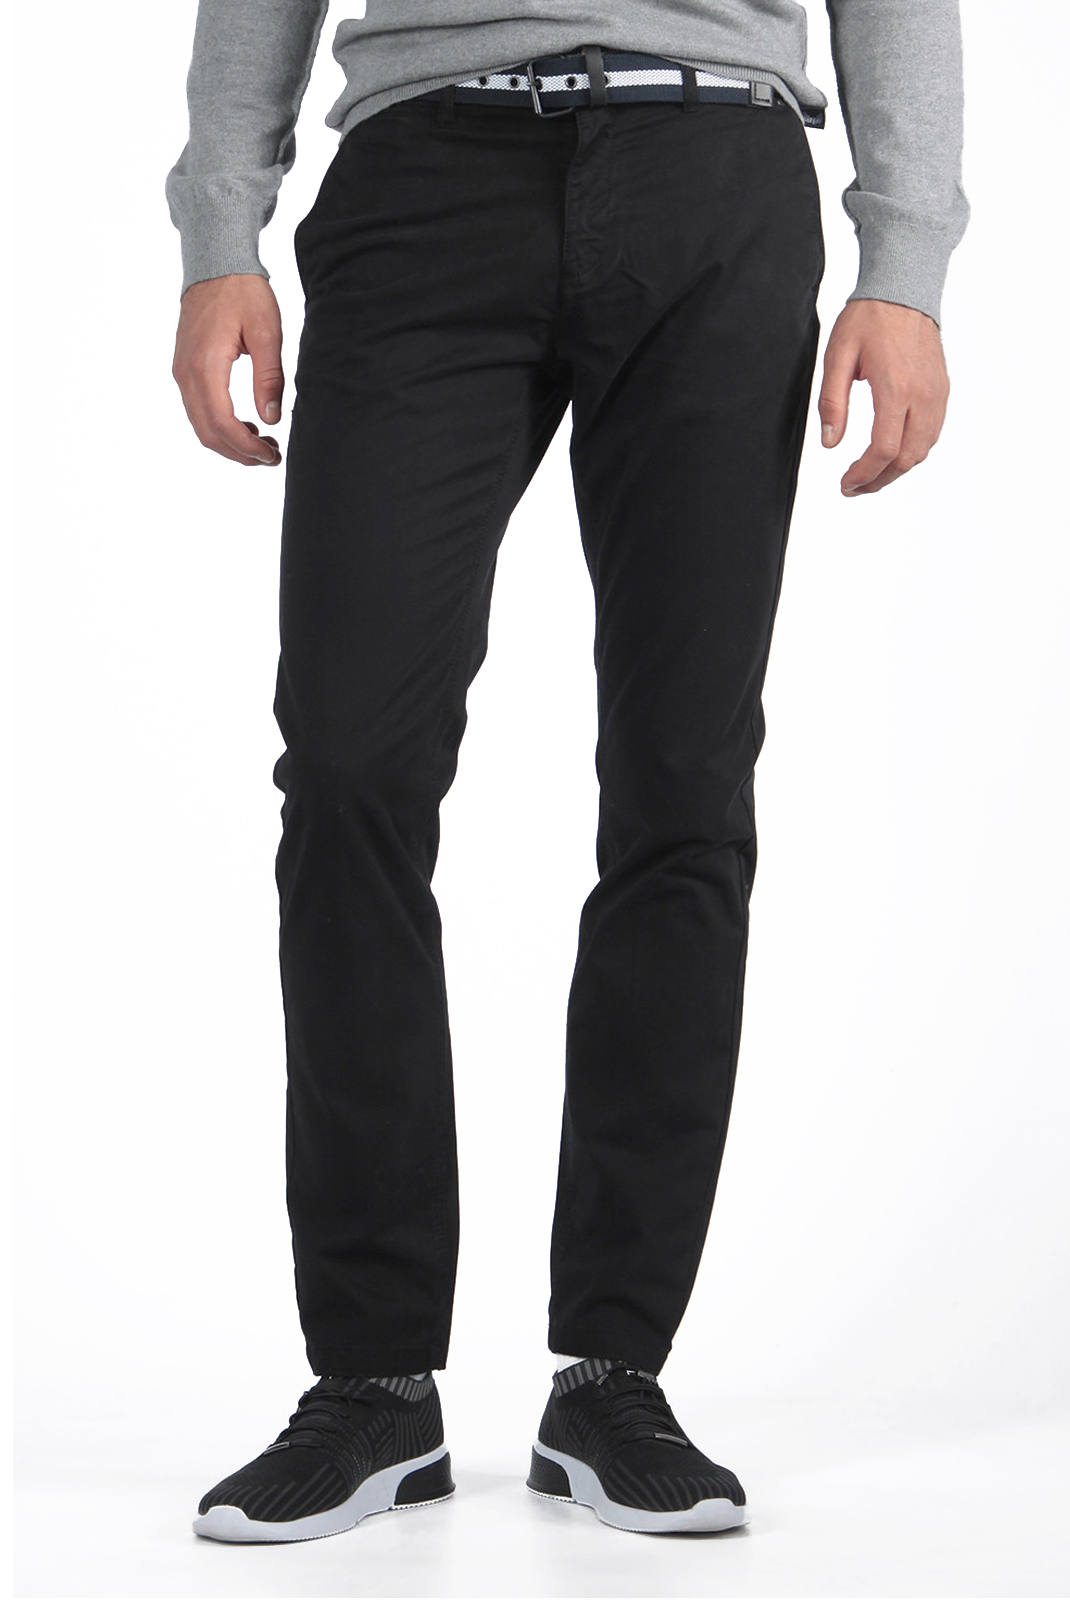 Pantalons chino/citadin  Kaporal ROULA BLACK